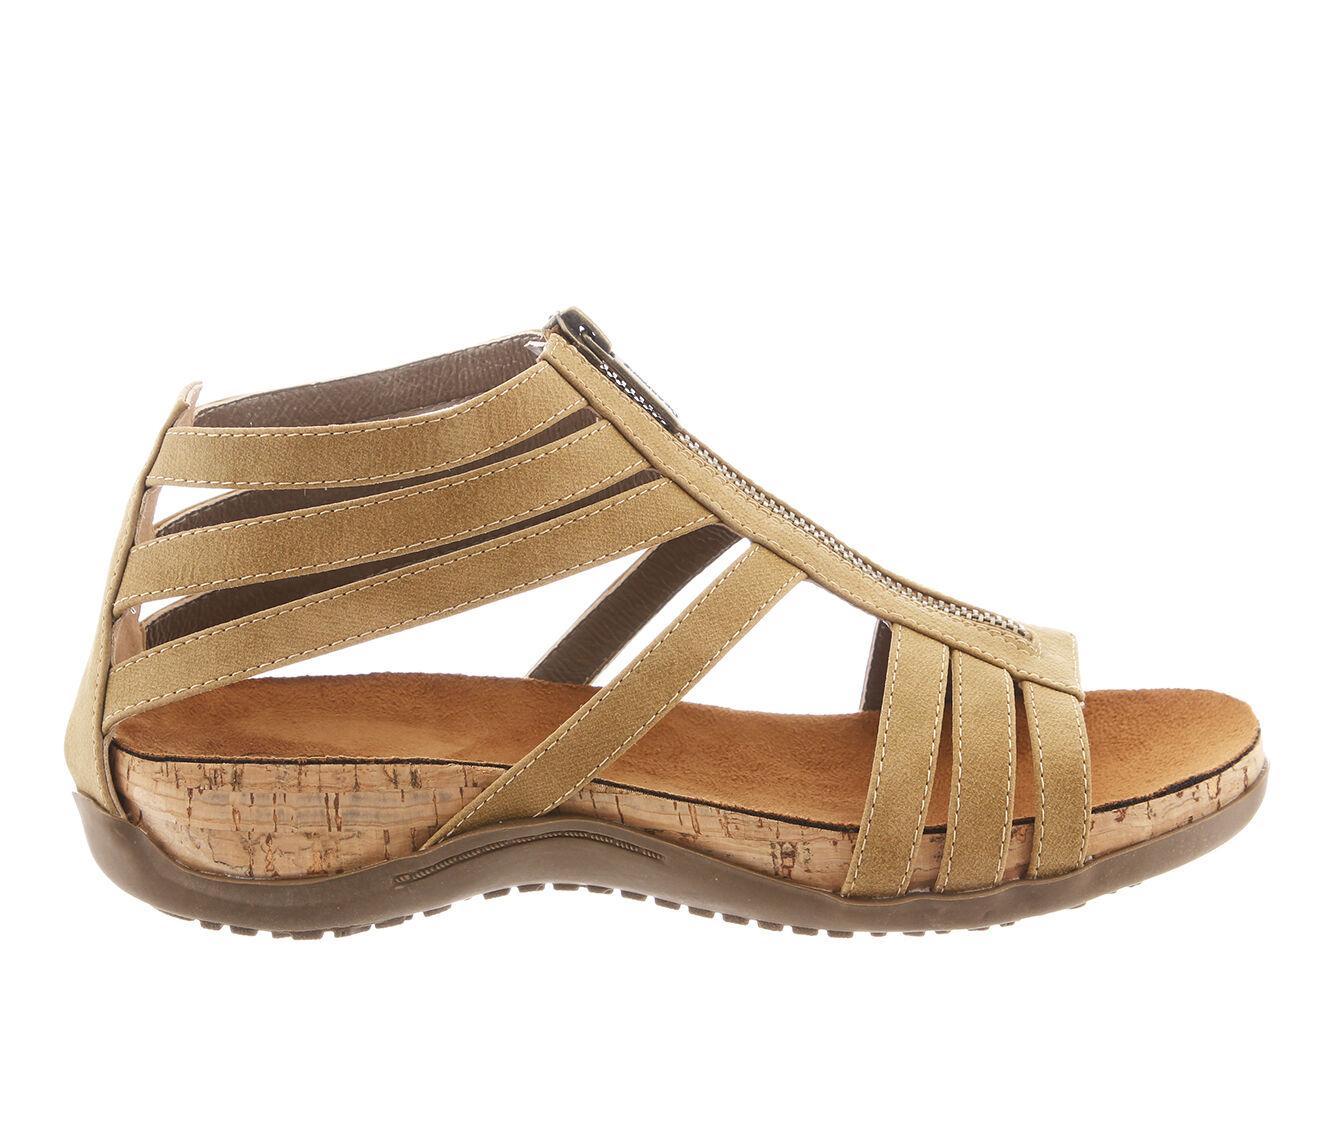 get classic Women's Bearpaw Layla Footbed Sandals Tan